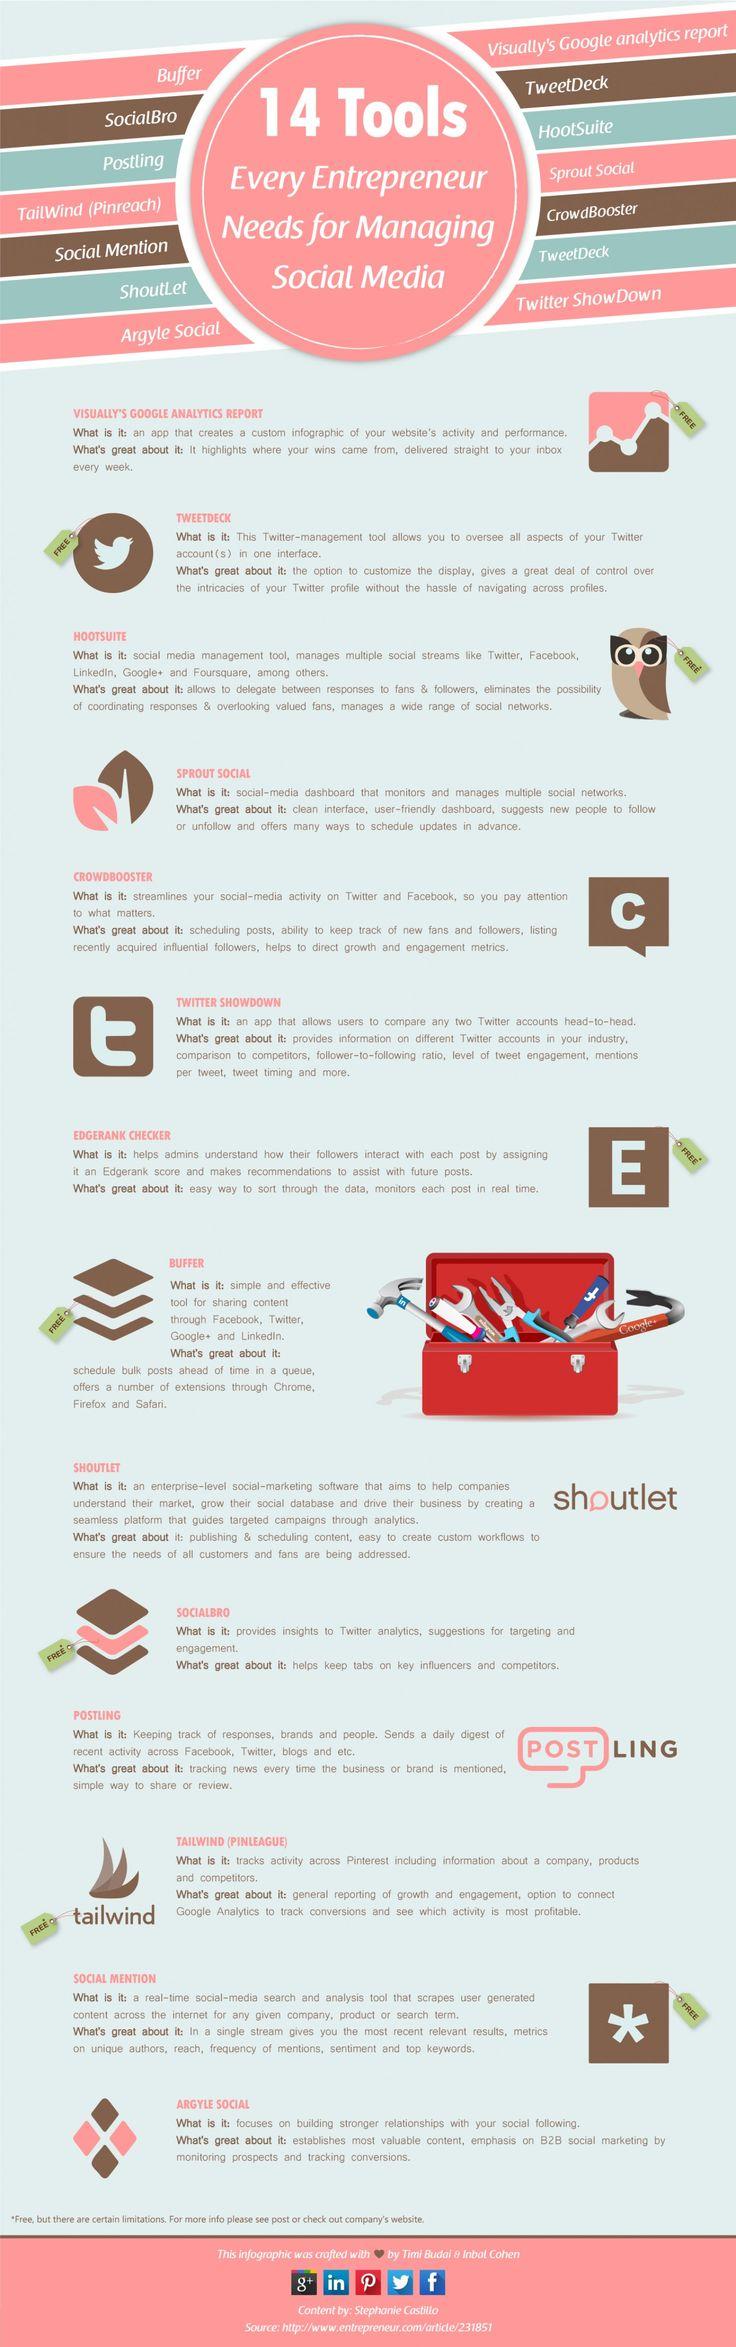 14 tools that every entrepreneur needs for managing social media. #socialmedia